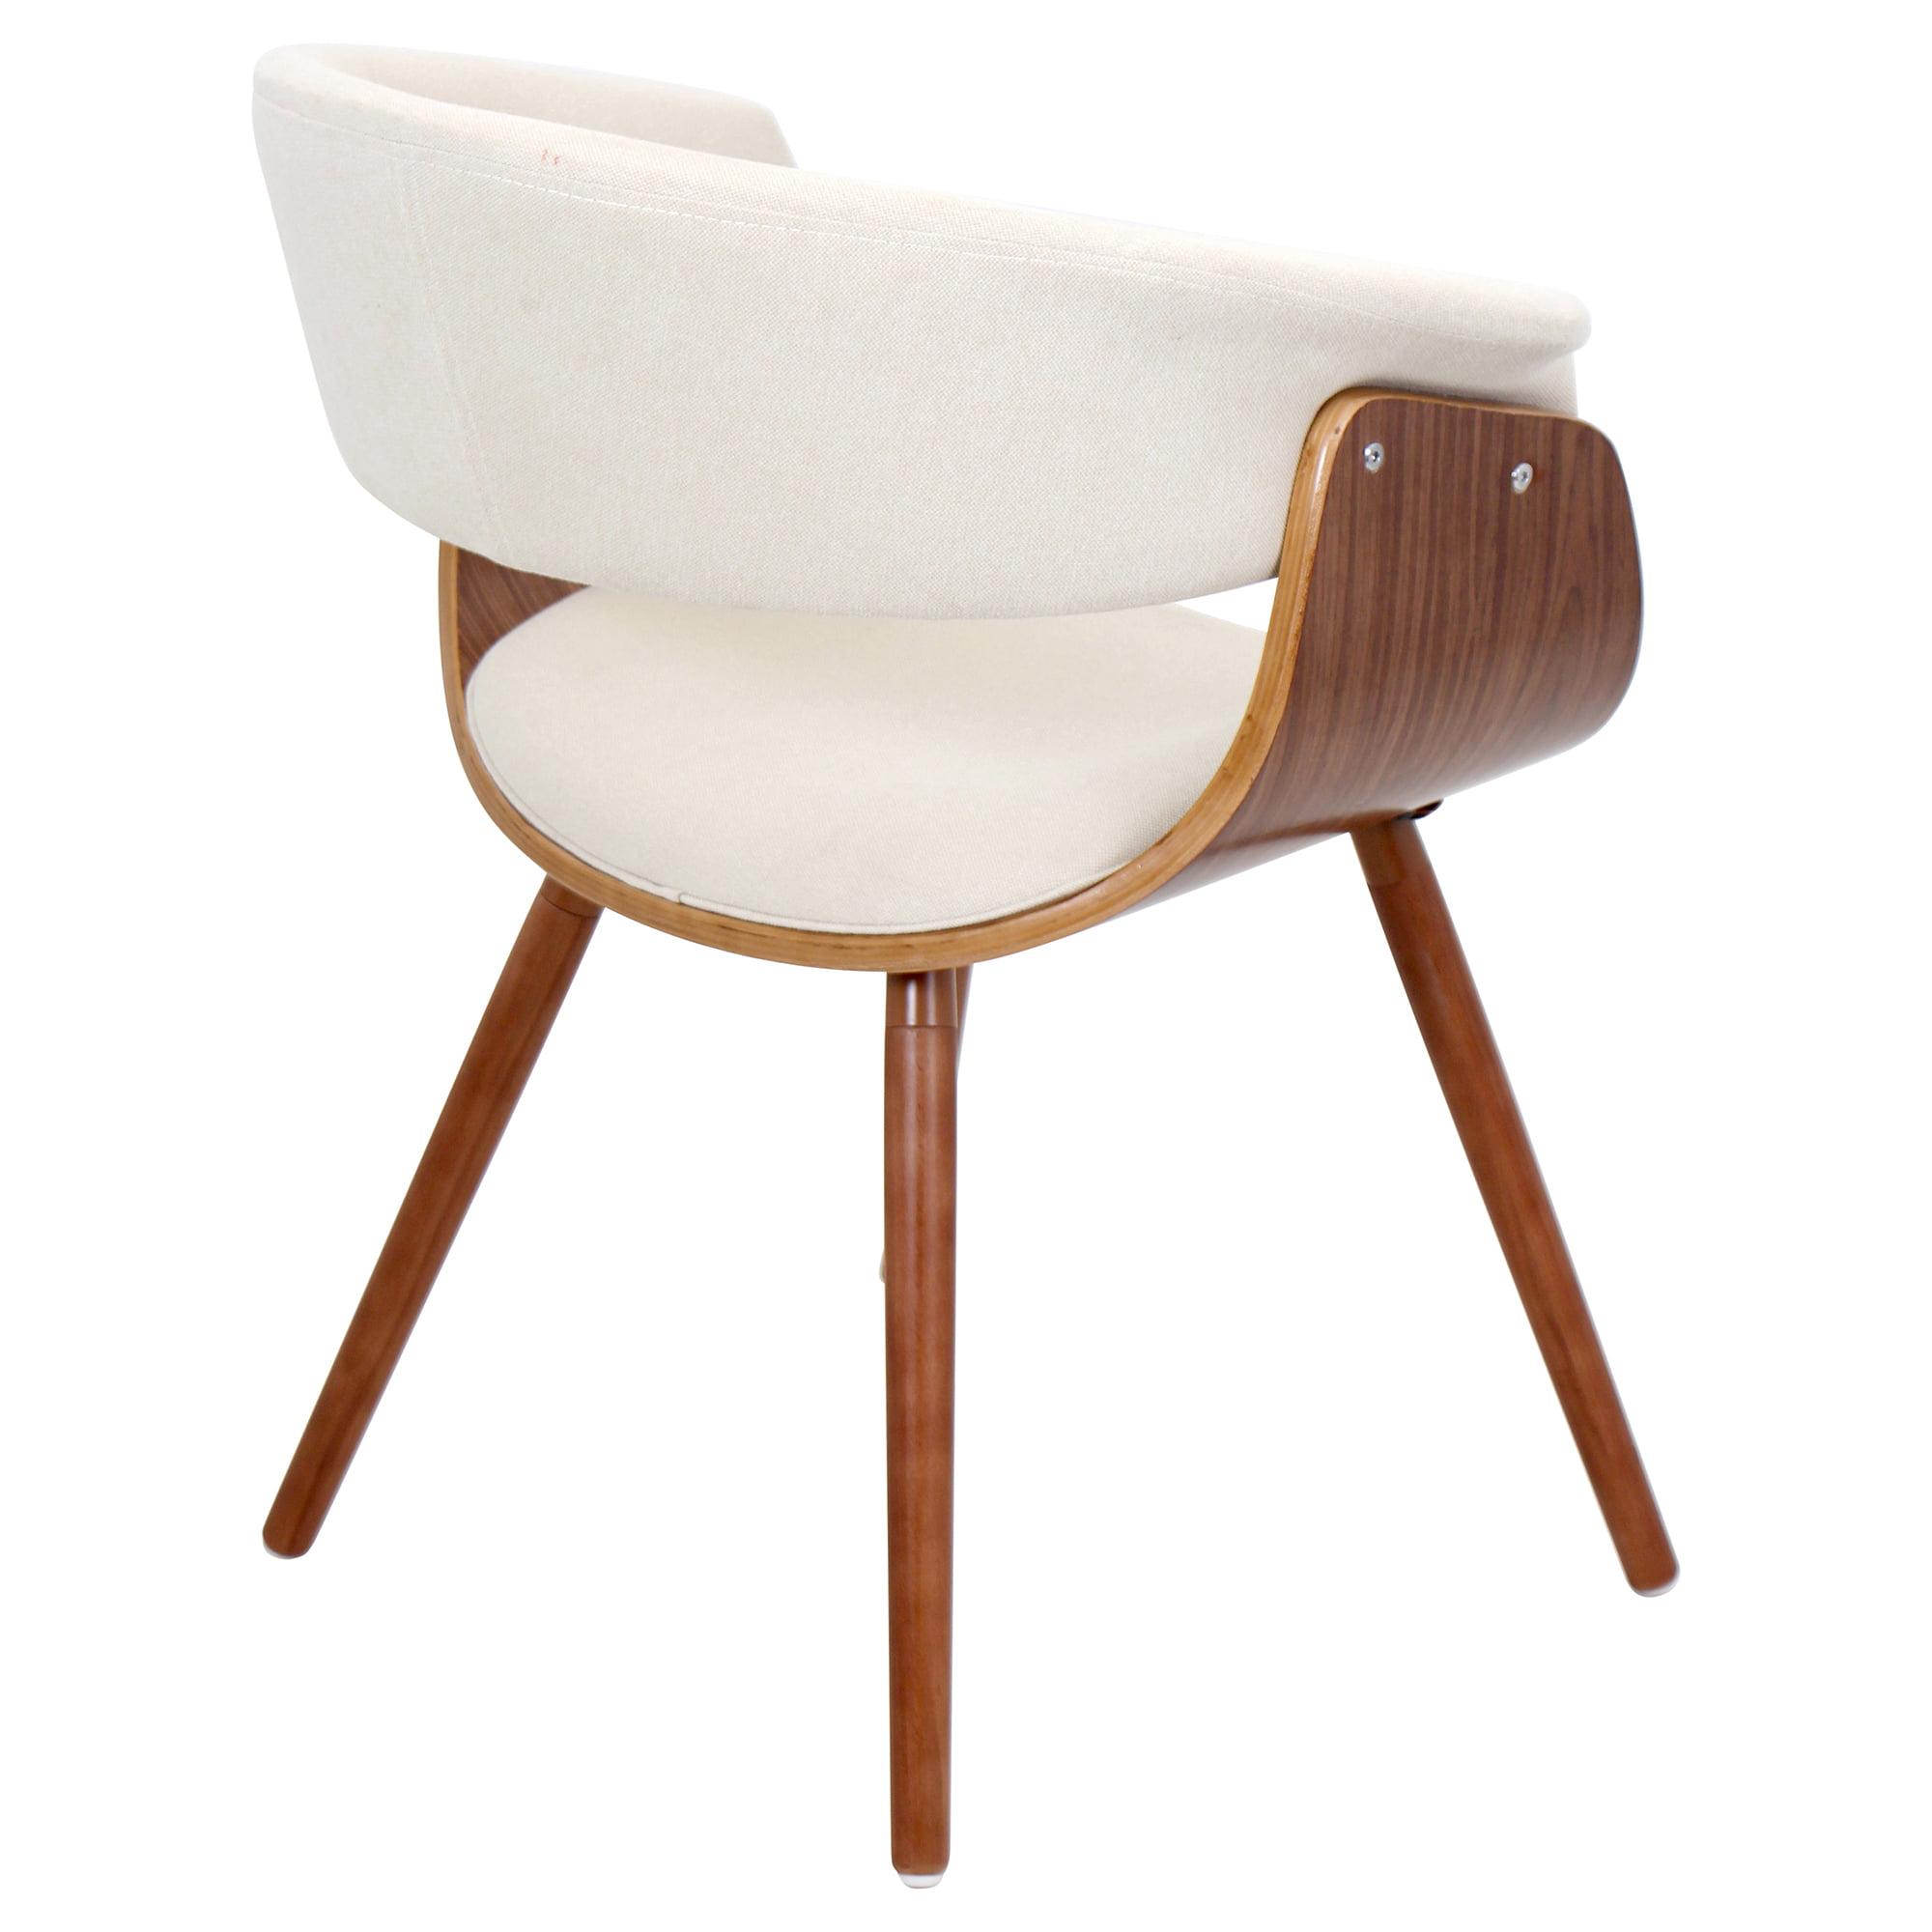 Vintage Mod Mid Century Modern Chair In